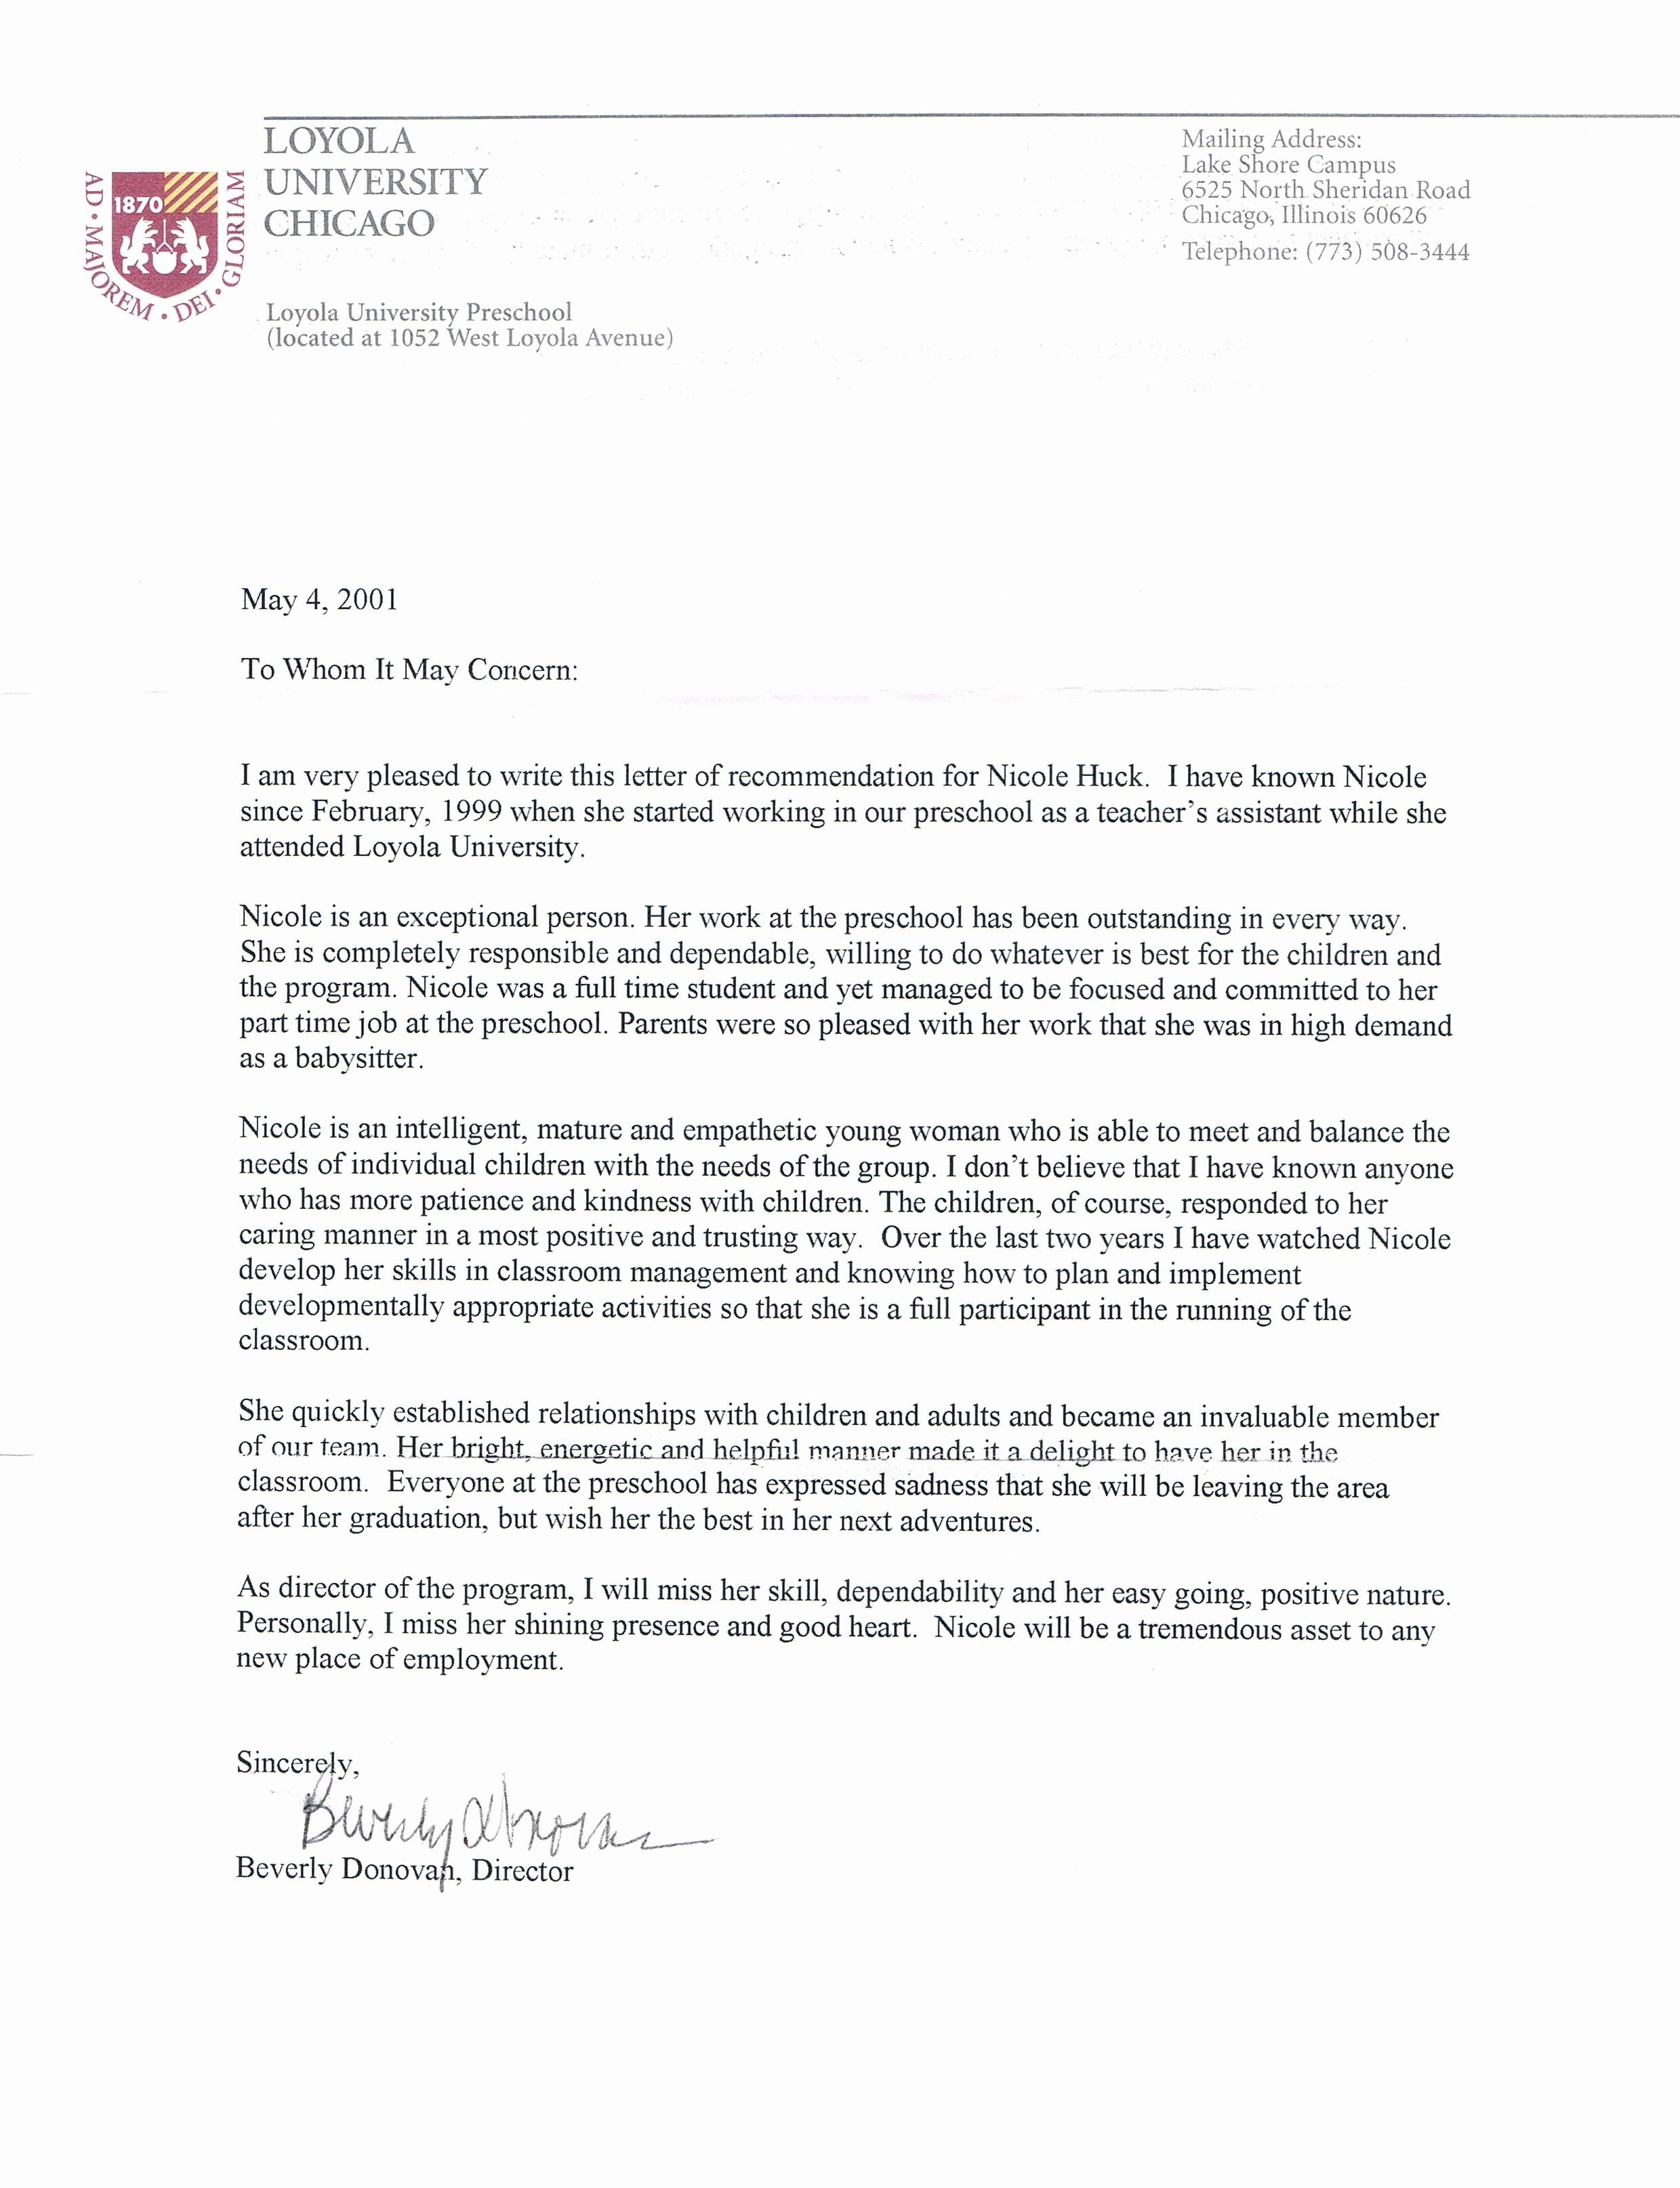 Recommendation Letter Template for Teacher Elegant Re Mendation Letter for A Nursery Teacher